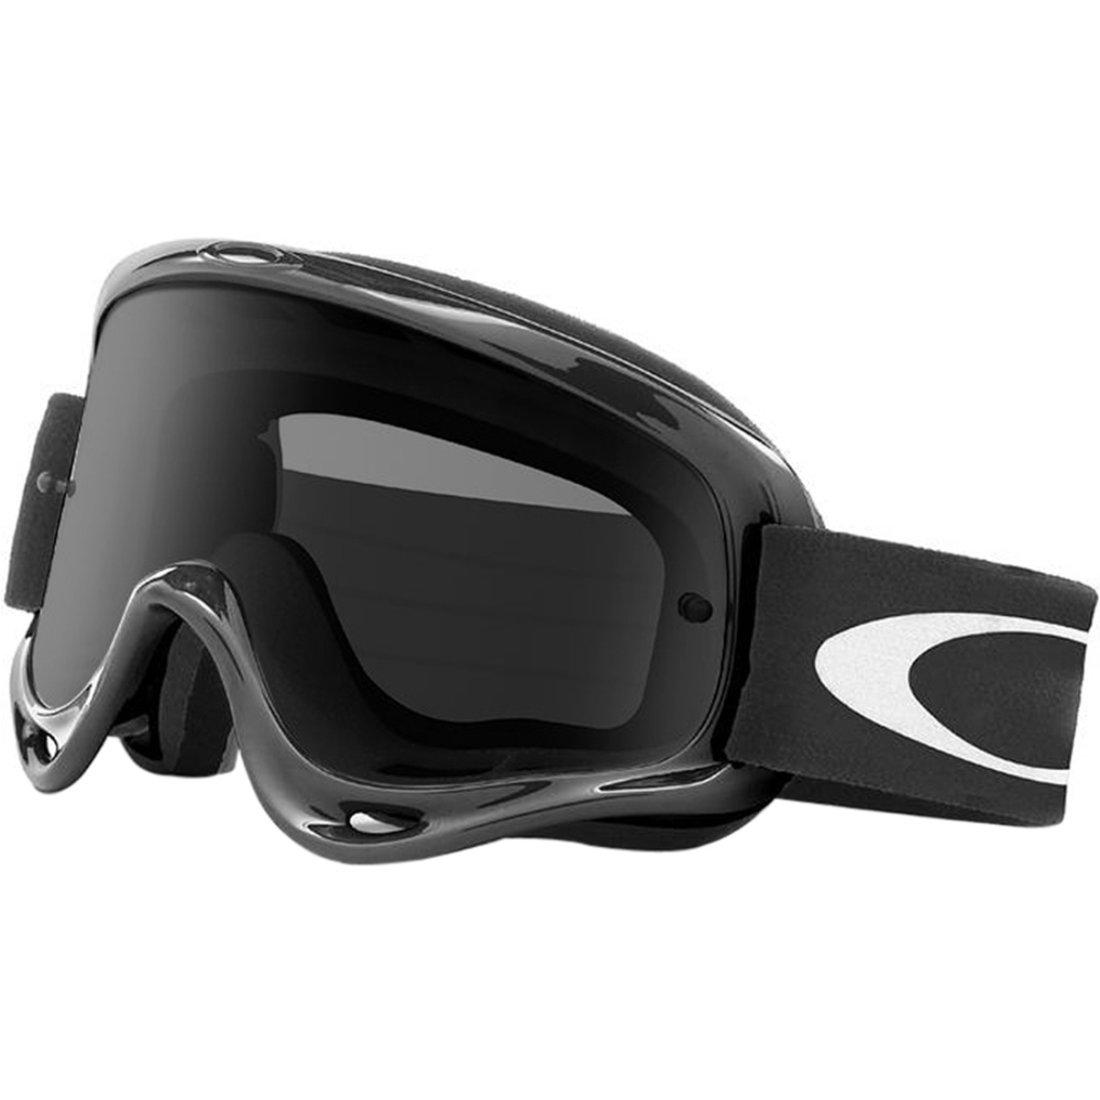 6b7a818a66 OAKLEY MX O-Frame Jet Black Dark Grey Goggles · Motocard